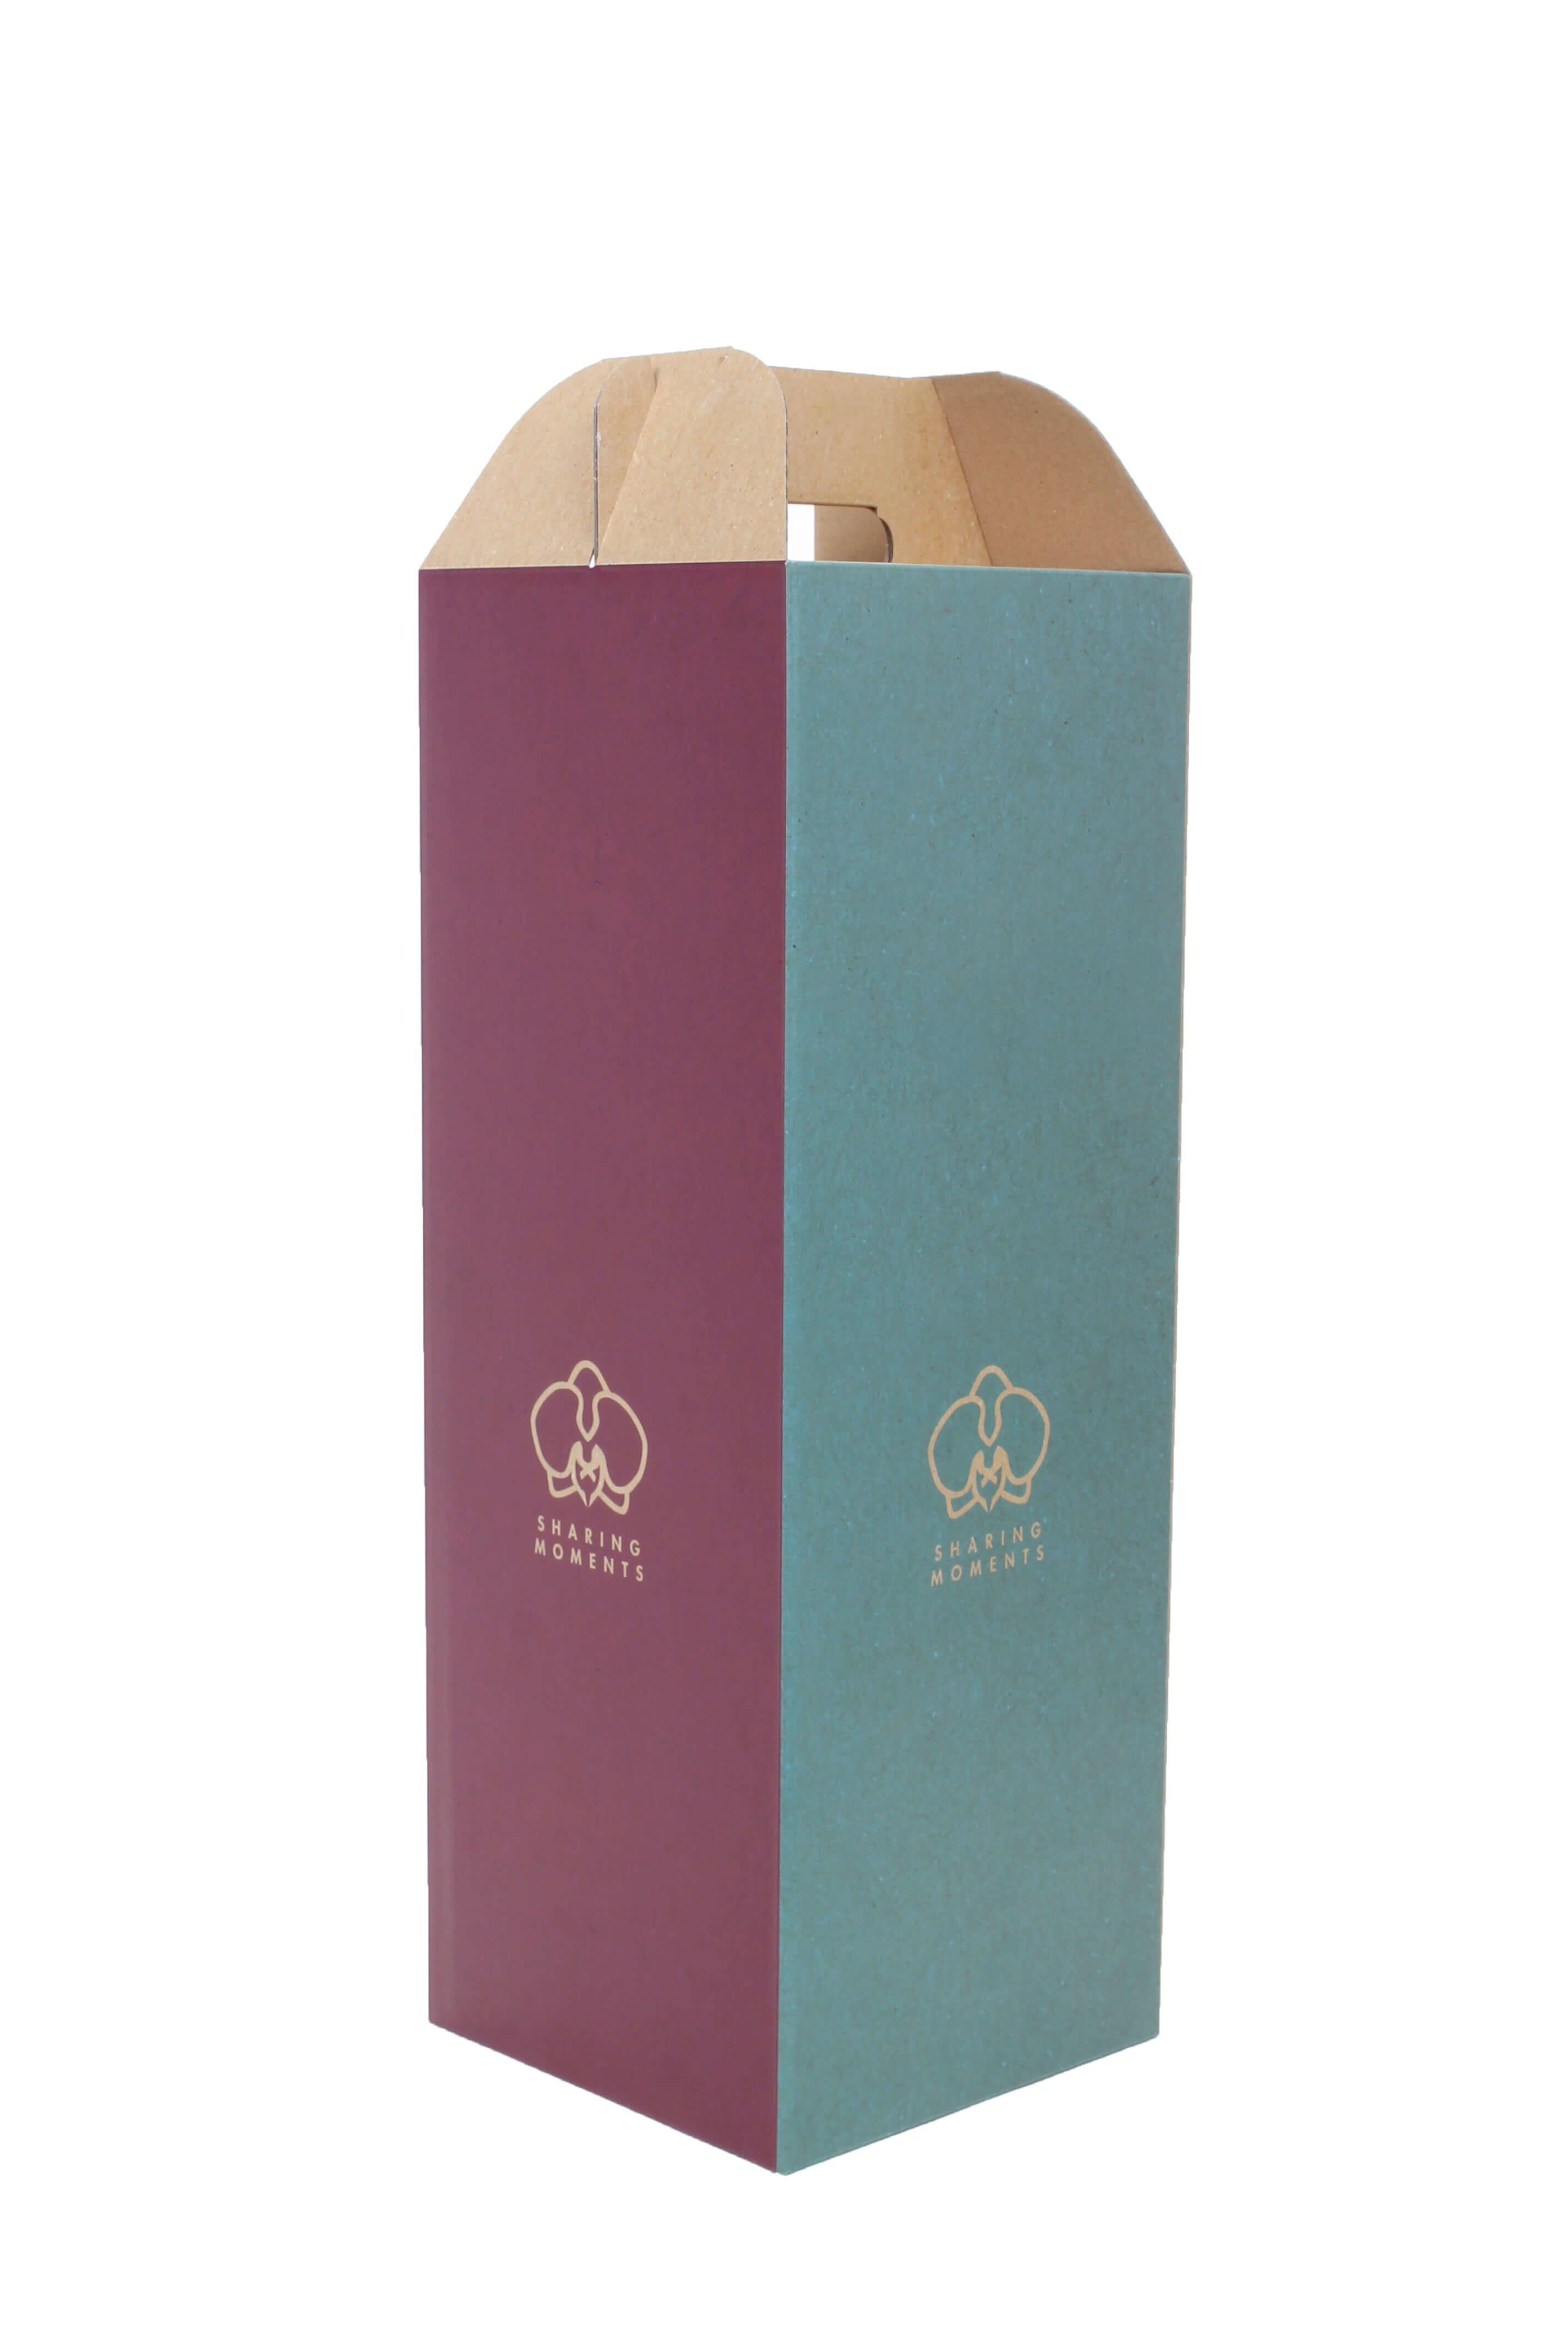 Verpakking 'Starlett Mini'